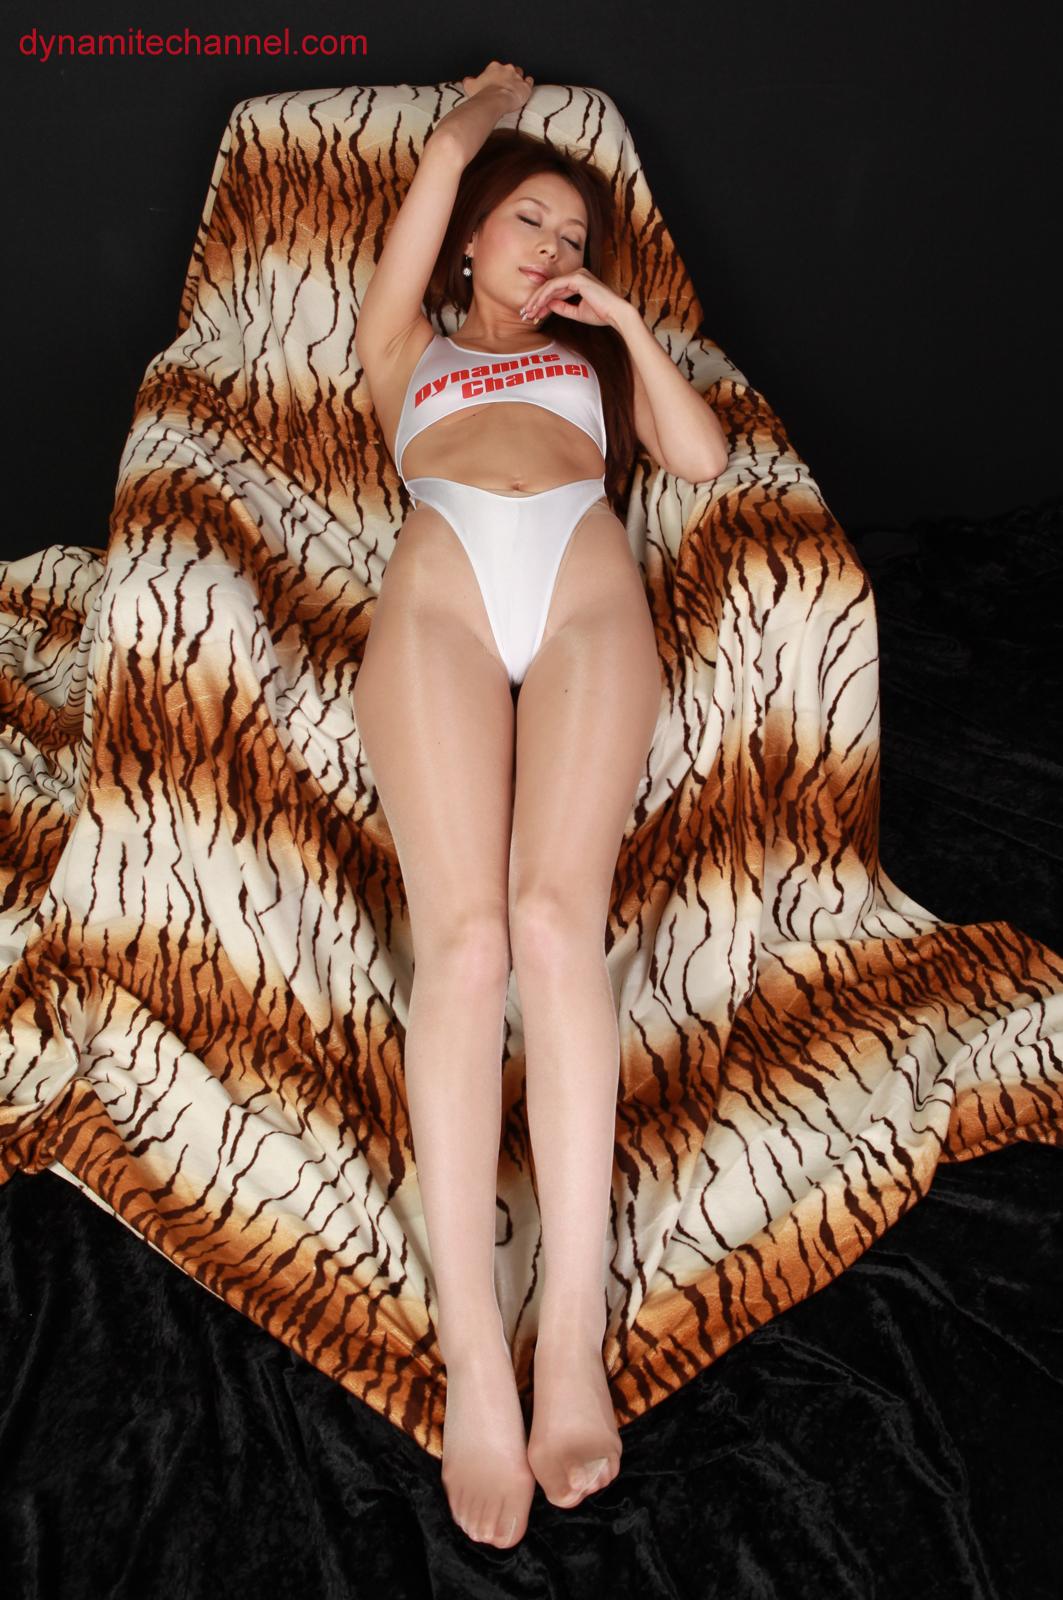 Eliska S - RunPorncom - Free Porn Tube